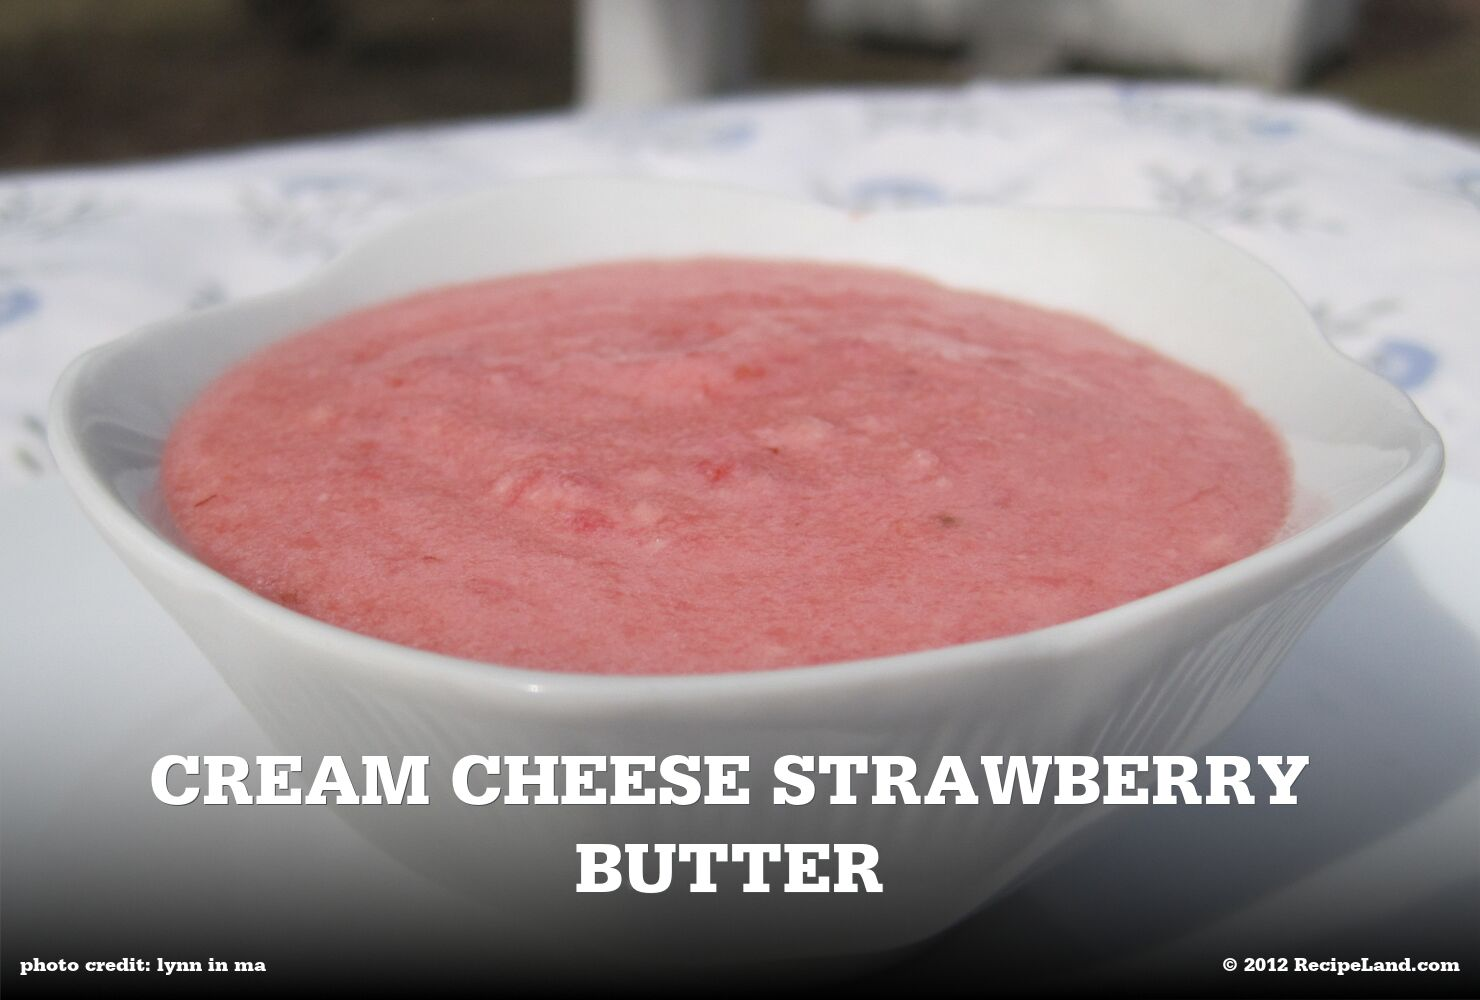 Cream Cheese Strawberry Butter